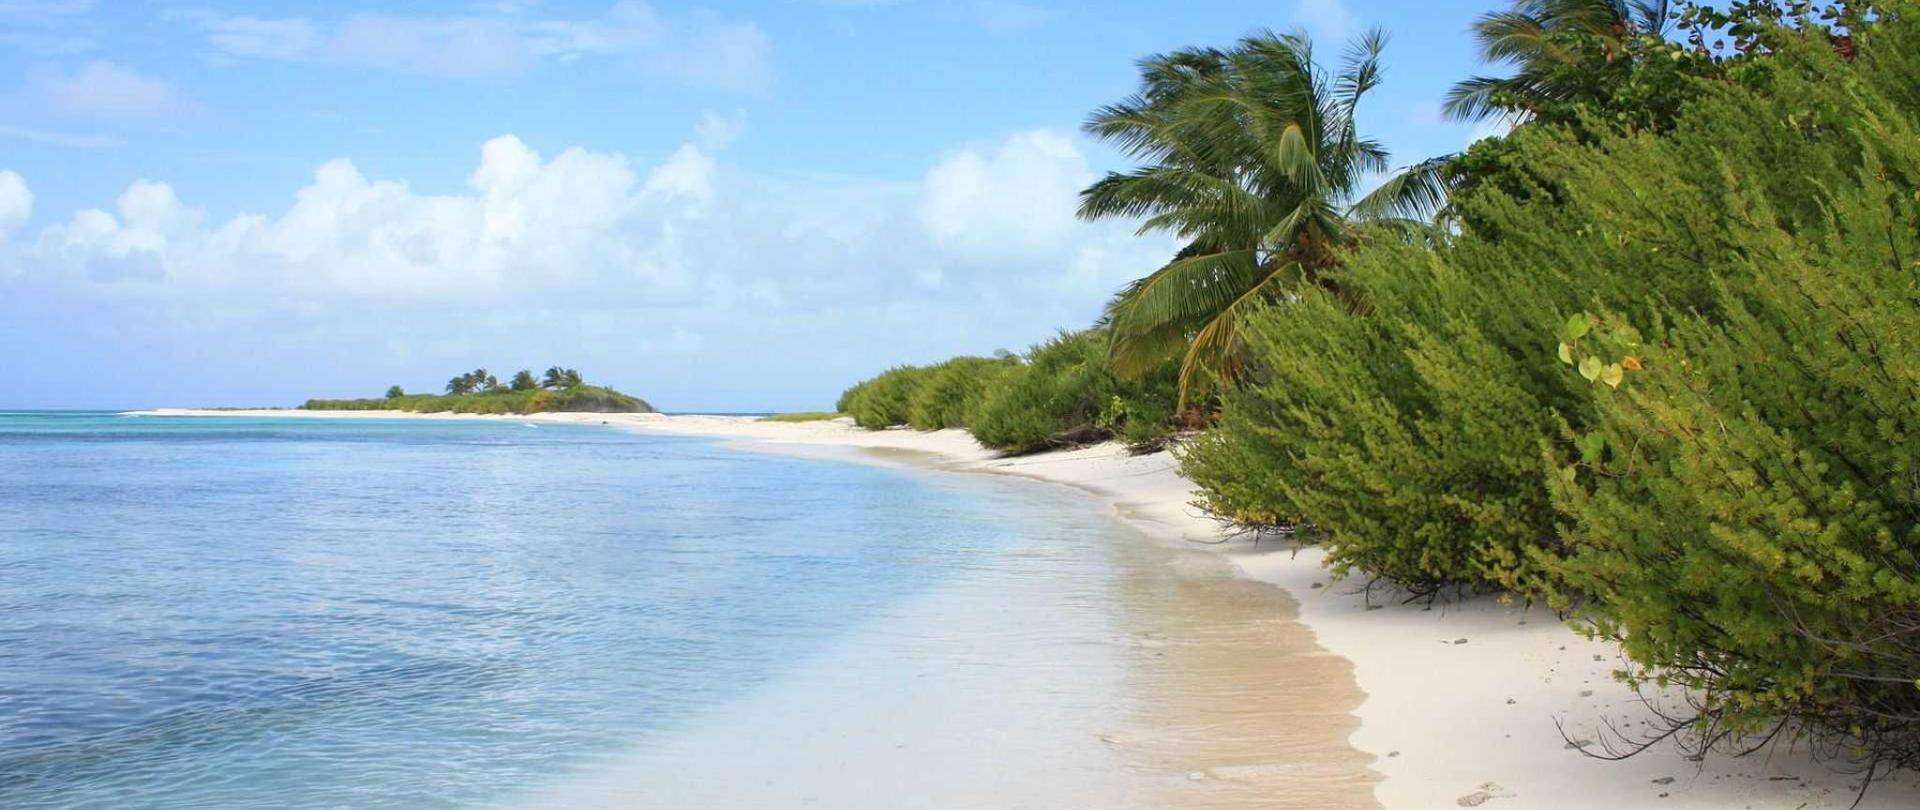 uninhabited_island_cayo_bolivar-1.jpg